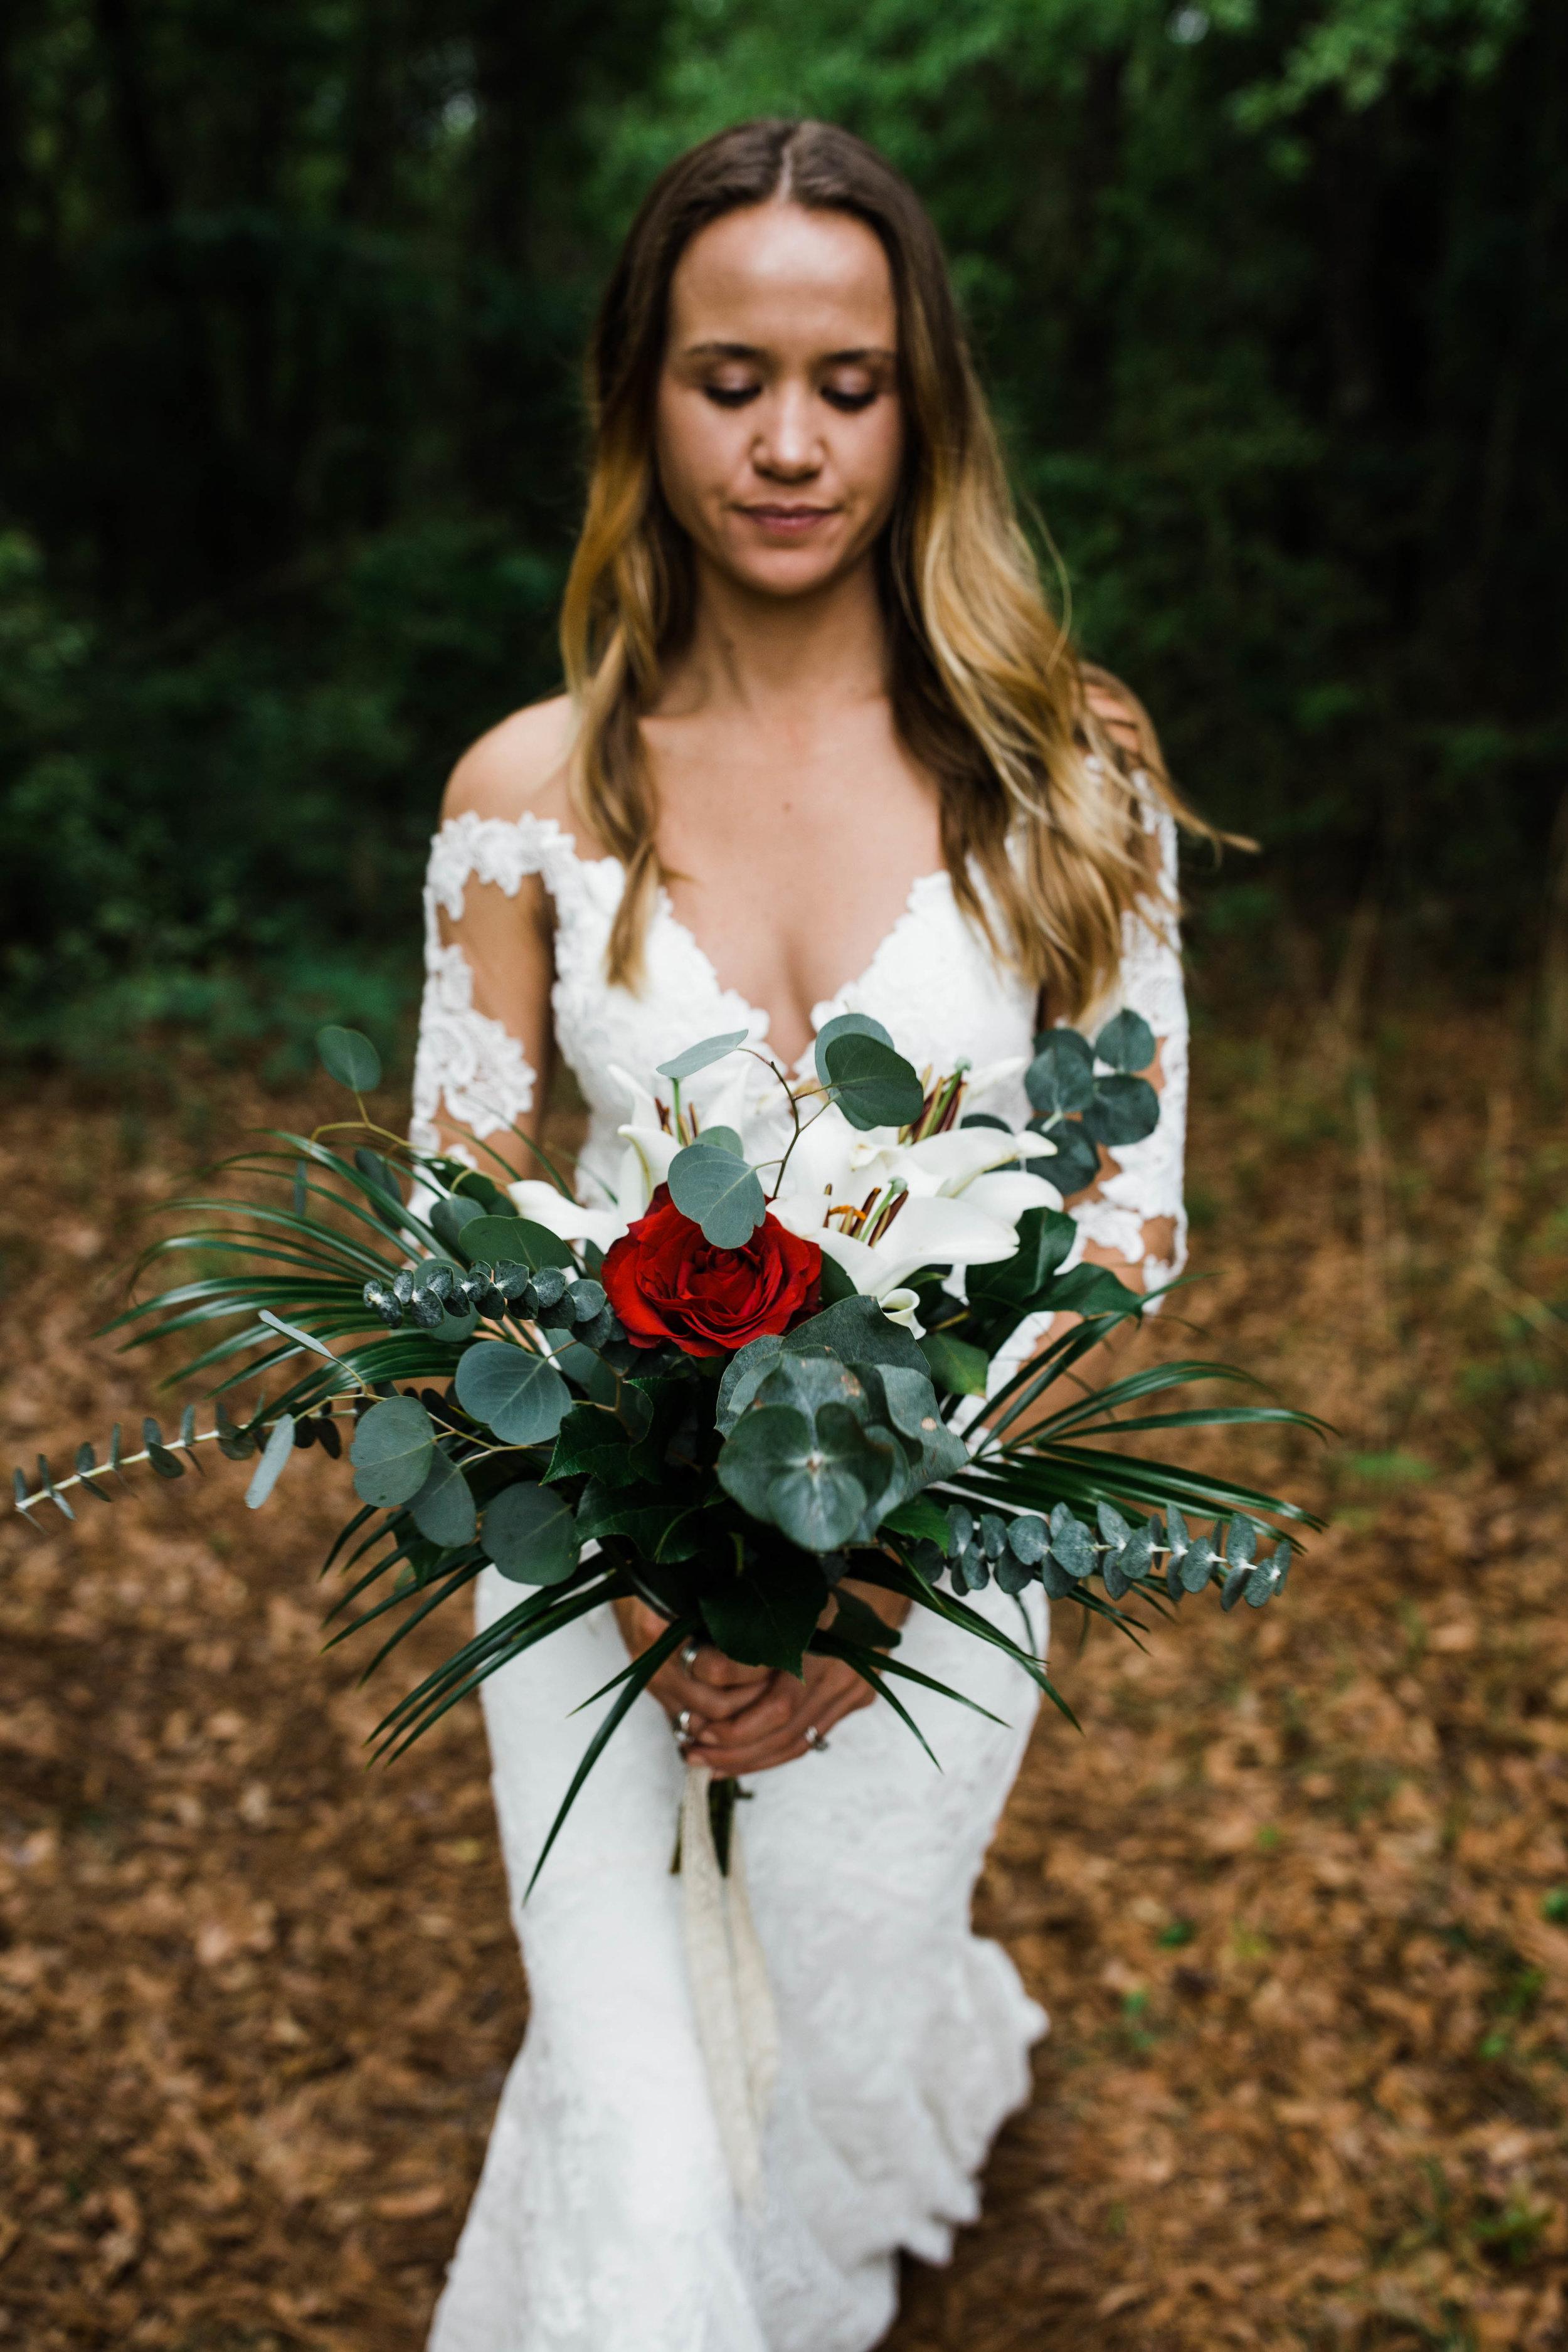 Slot canyon elopement inspiration shoot